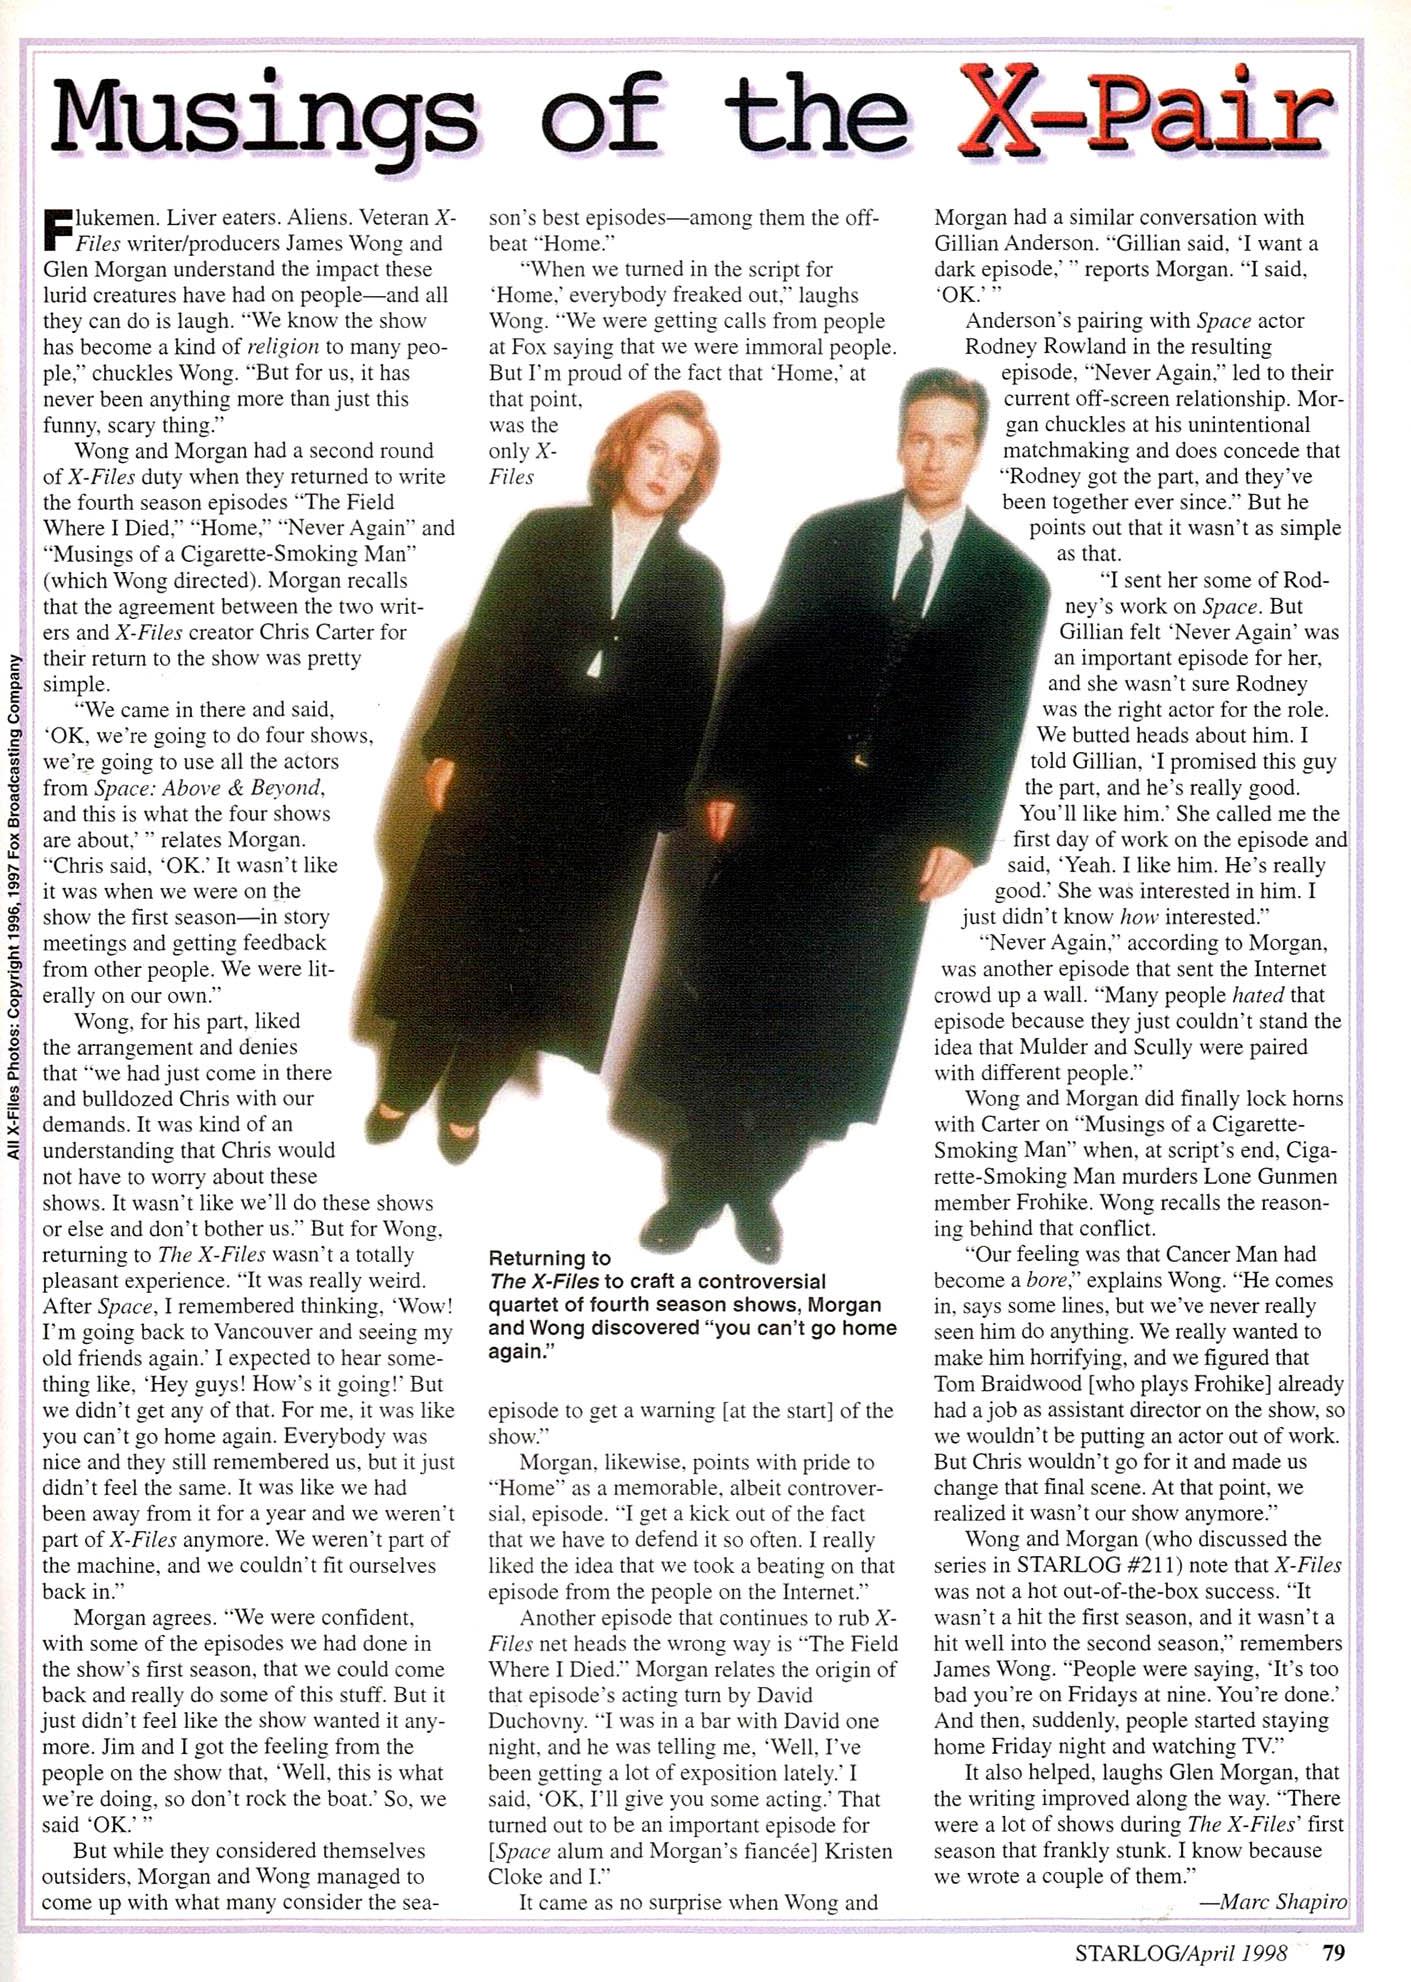 Starlog 249 1998 04 X-Files-1.jpg